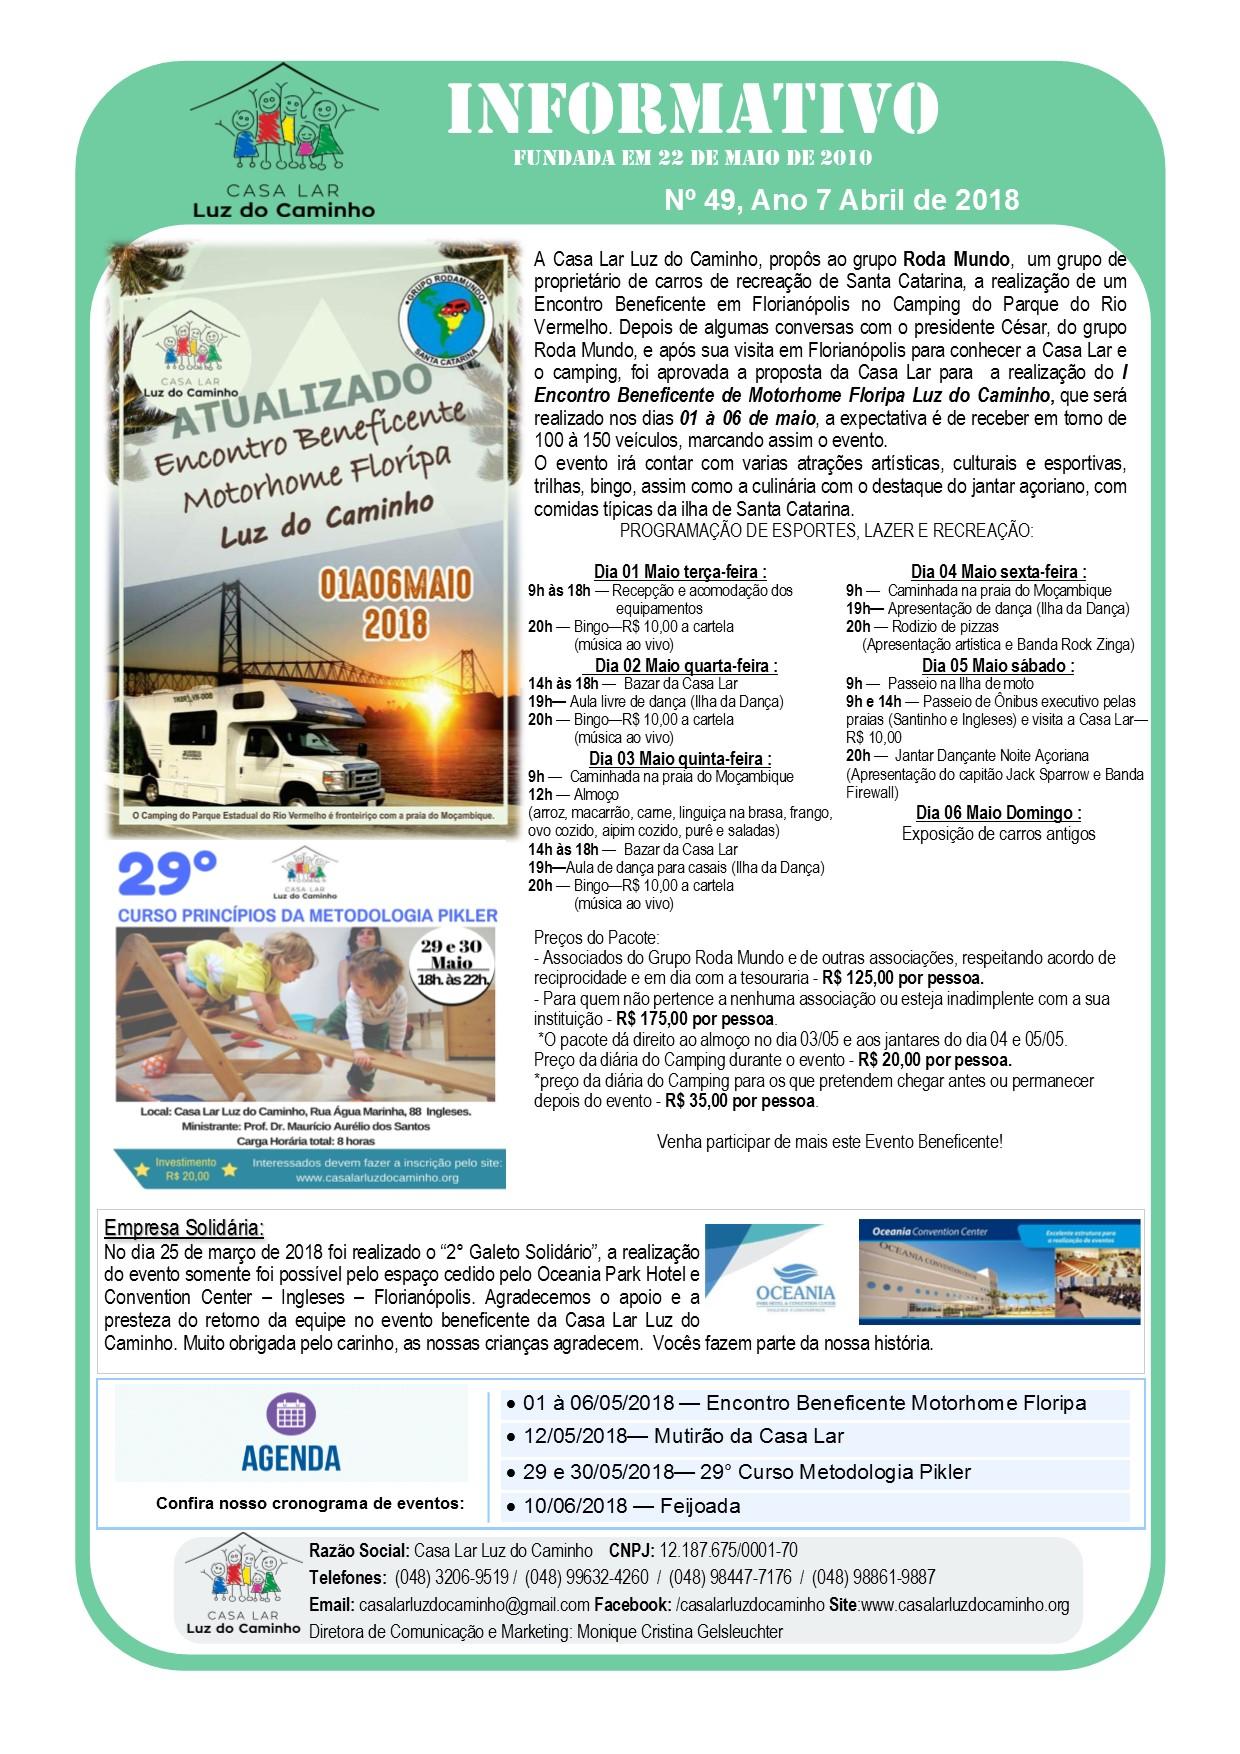 Informativo 04/18